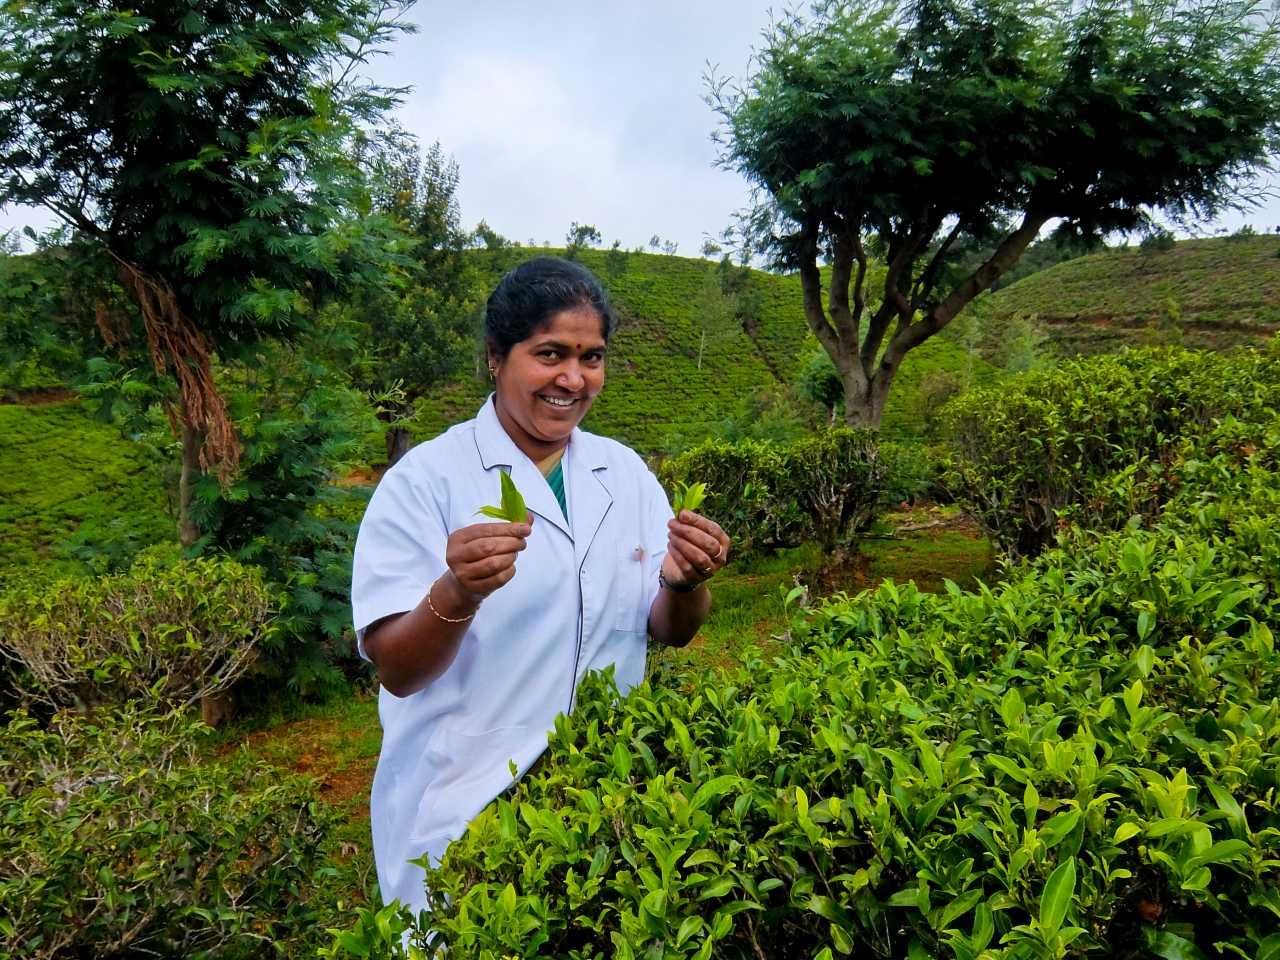 Sri Lanka road trip - Tea Picking